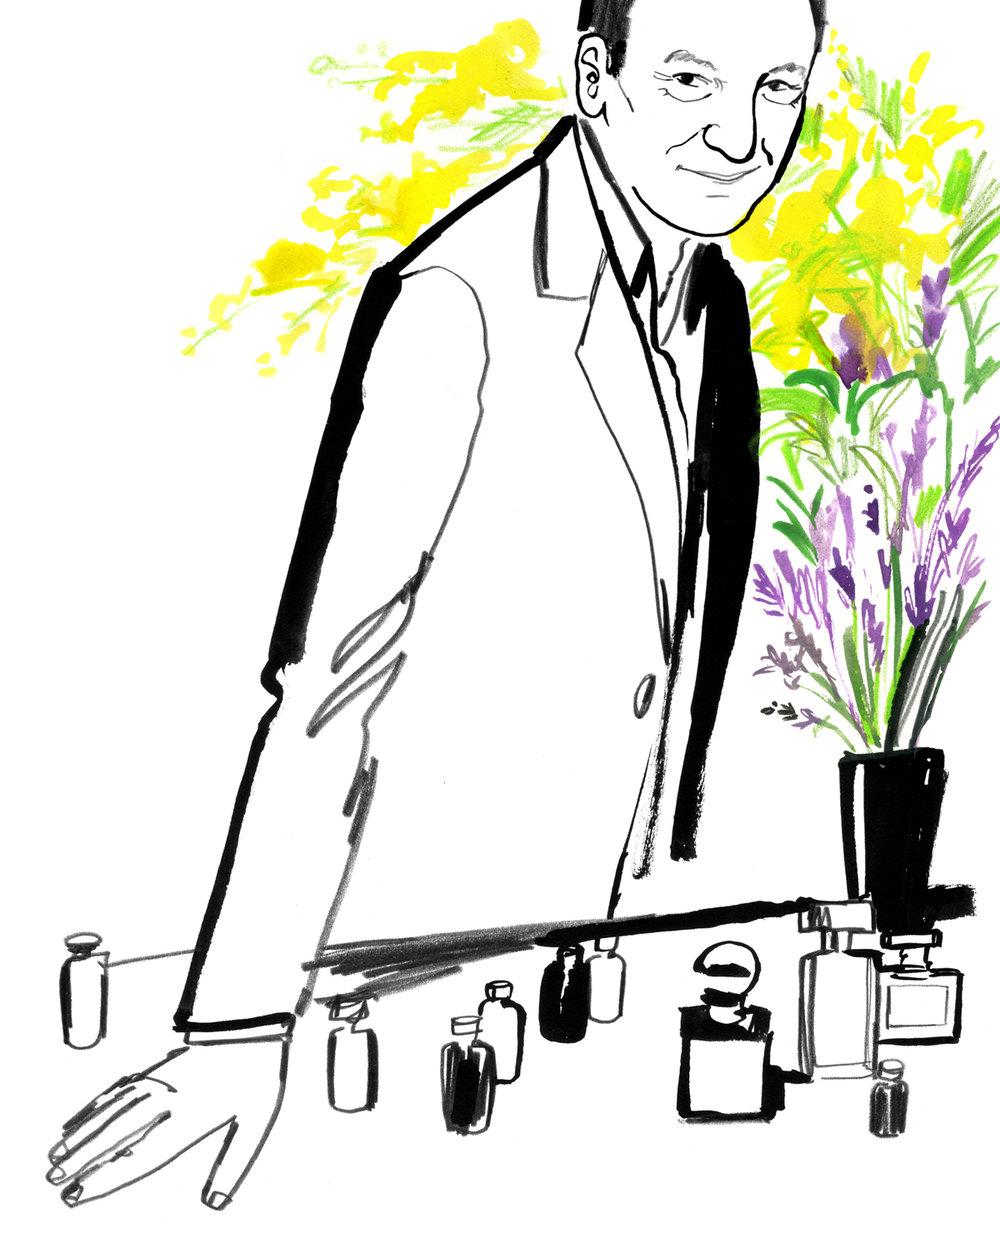 Perfumer Harry Fremont